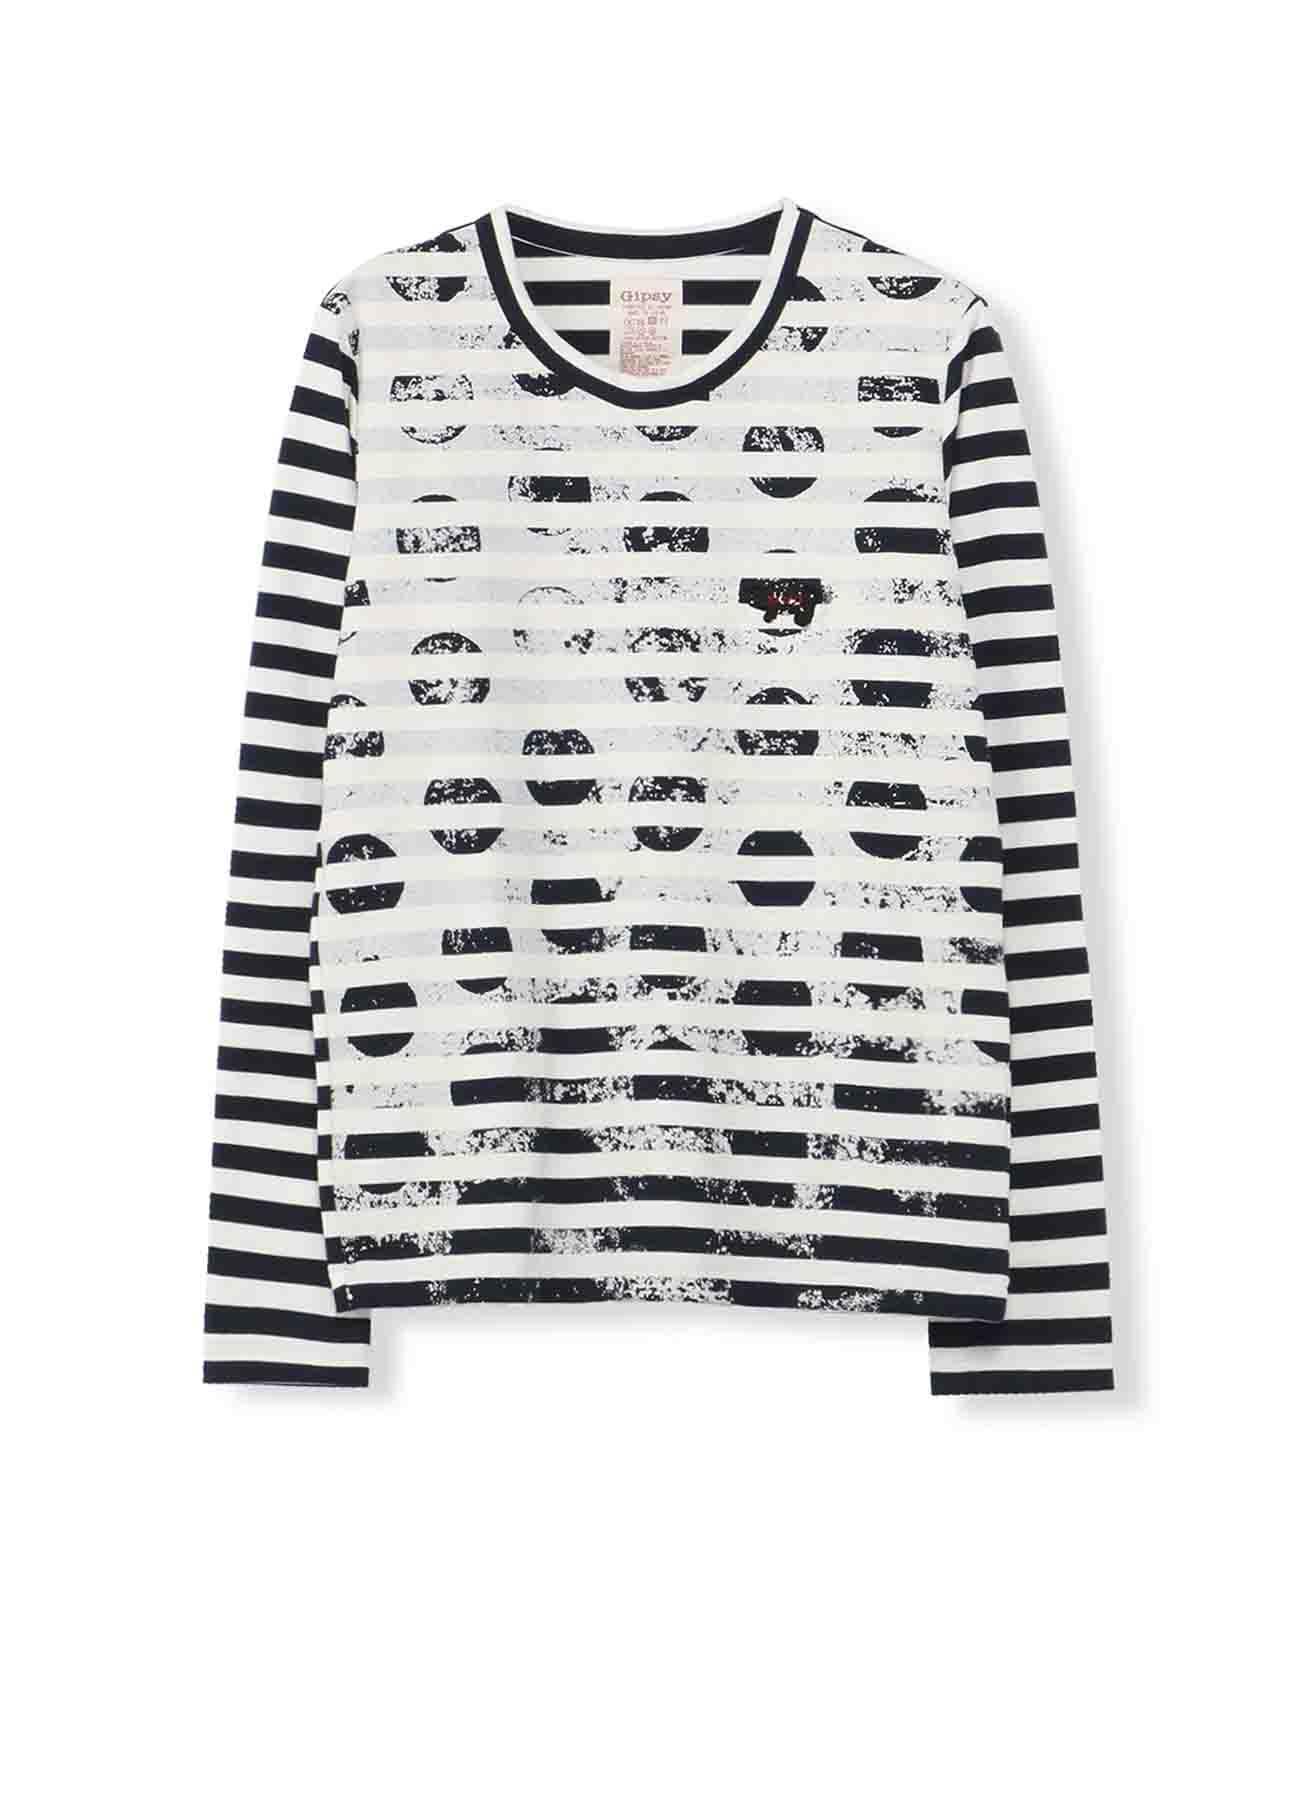 Gipsy ボーダー天竺擦れ水玉顔料プリント 丸首長袖Tシャツ